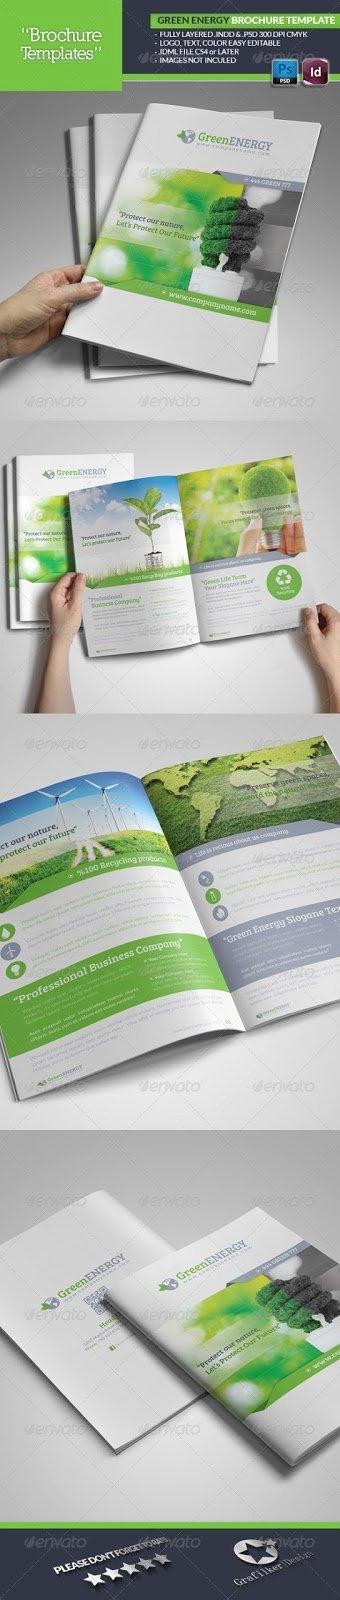 Stormwater Pollution Prevention Plan Template Elegant Brochure Zafira Pics Brochure Templates Pollution